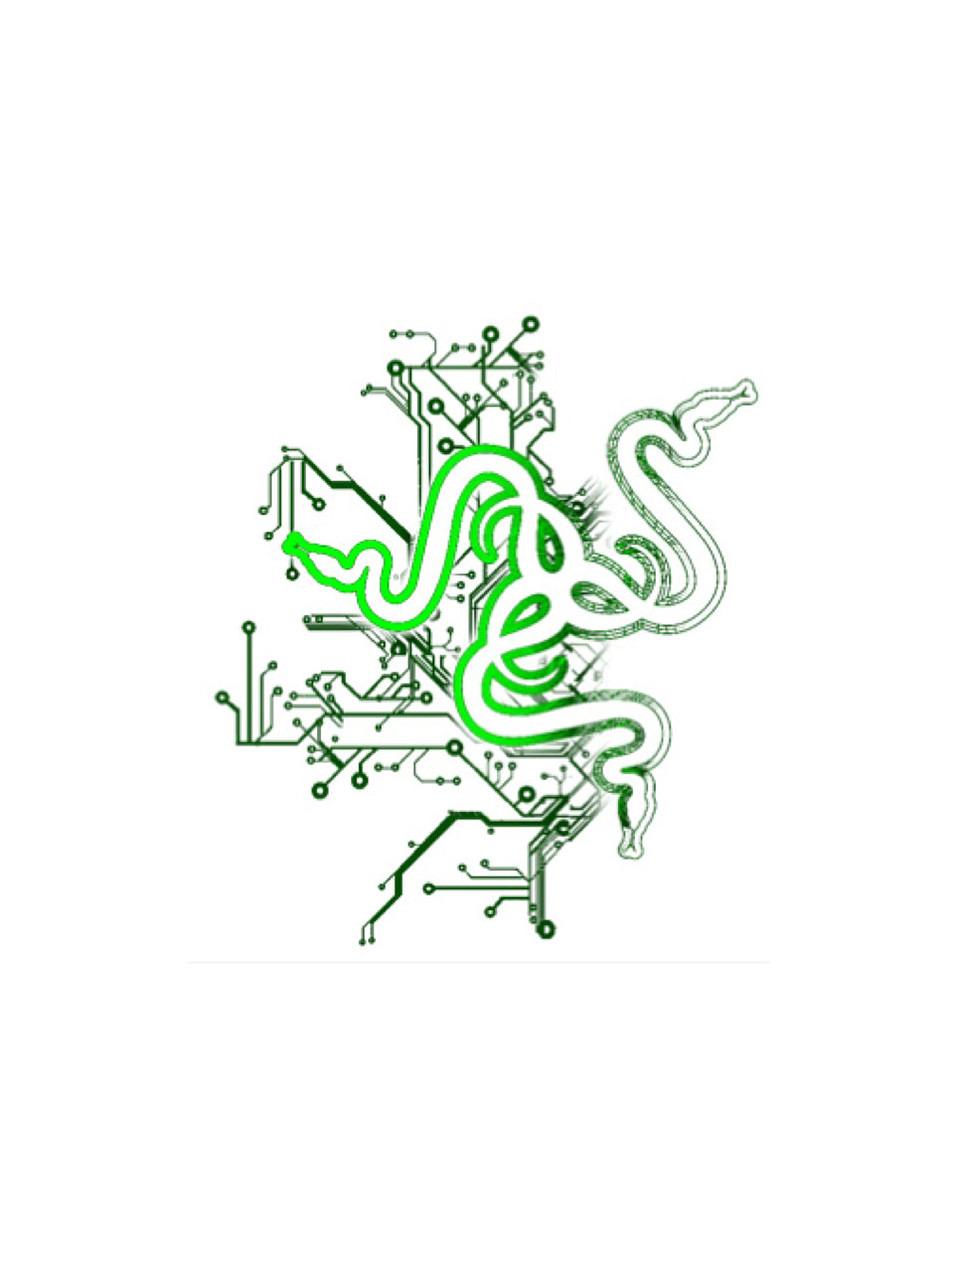 Razerの画像5点 完全無料画像検索のプリ画像 Bygmo